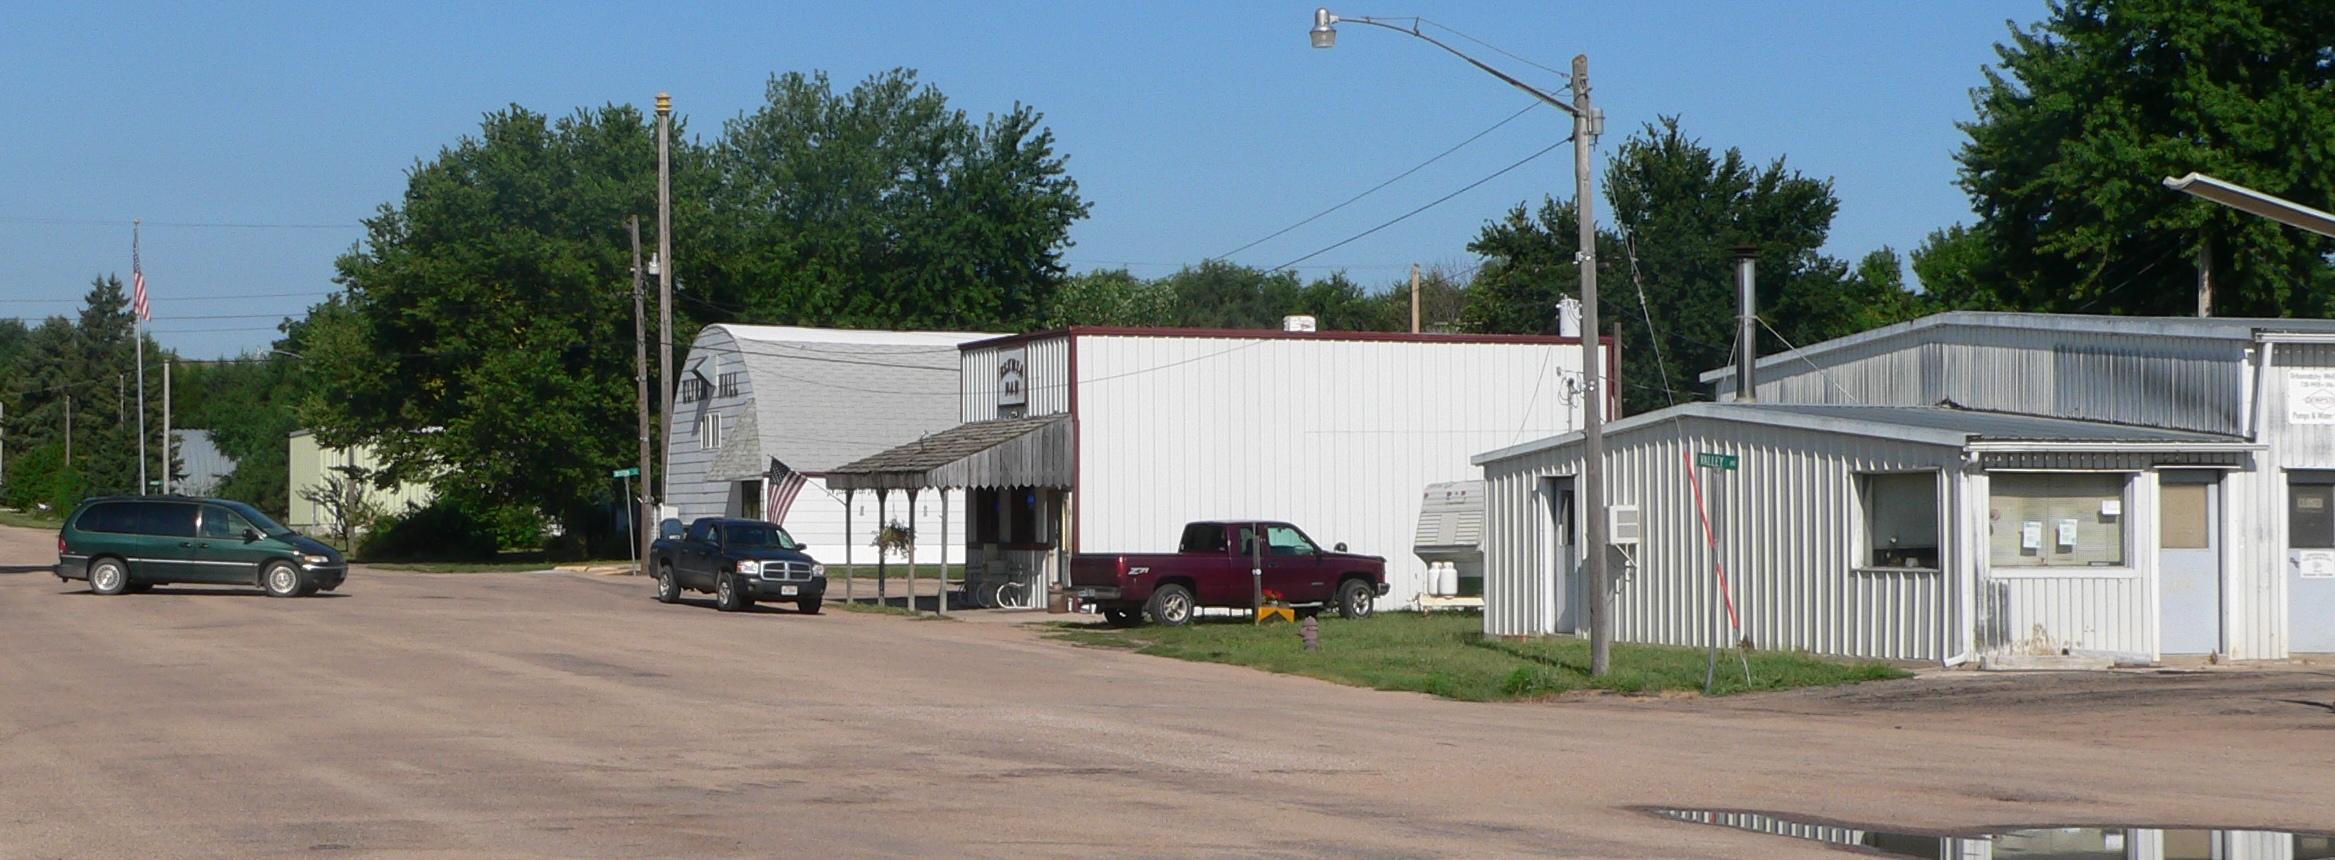 Elyria funeral homes funeral services flowers in nebraska for Nebraska home builders